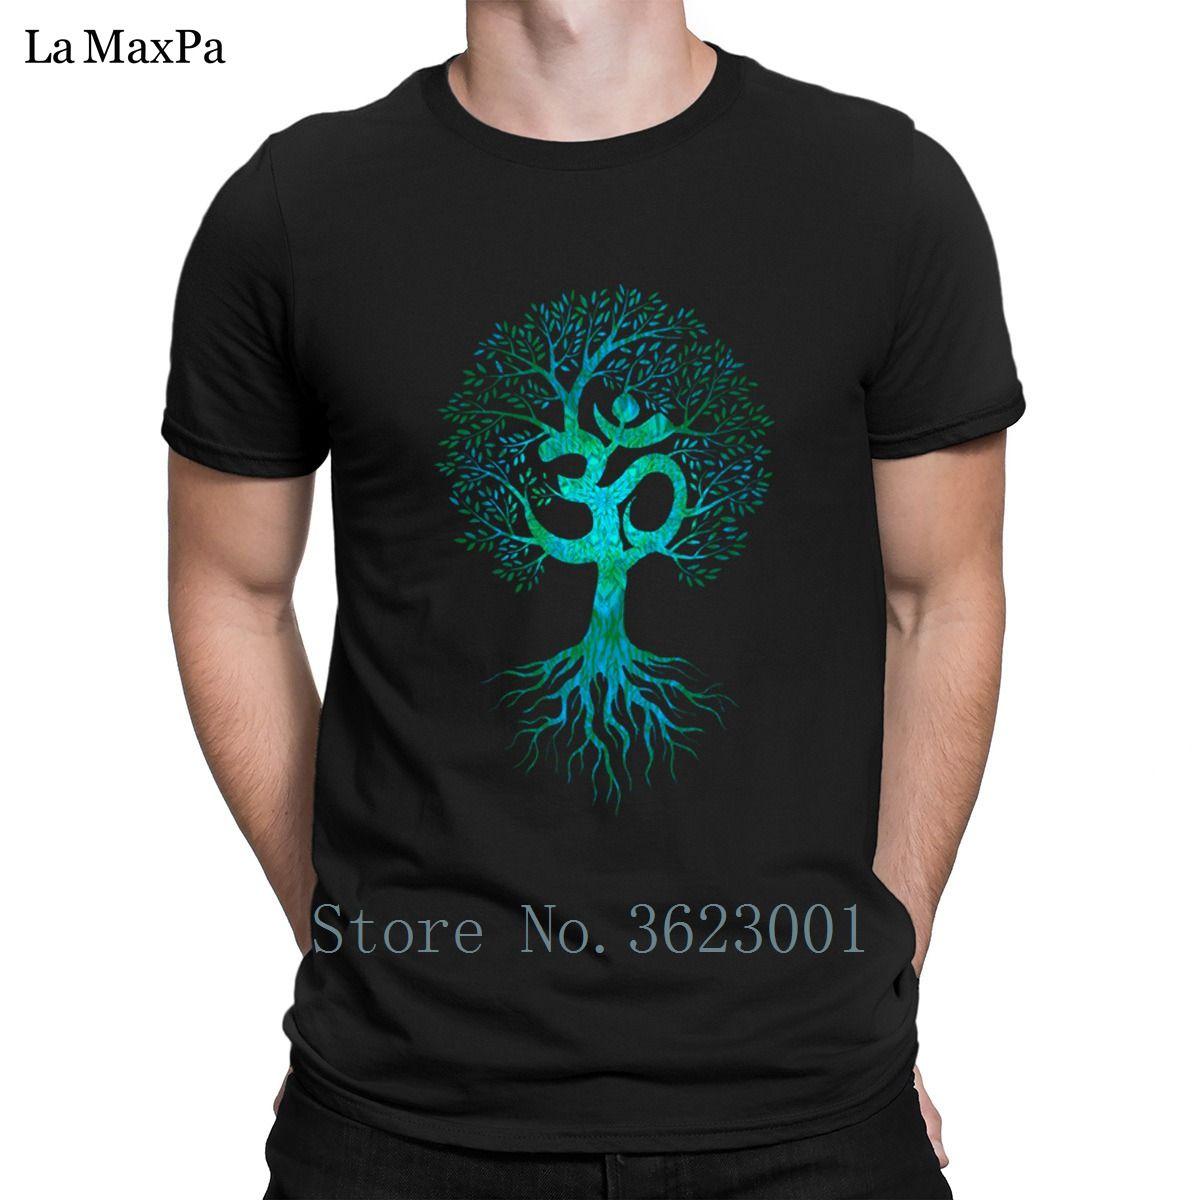 Creature Cool T Shirt Costume Om Tree Of Life Men T-Shirt Better Clever Men's Tshirt Size S-3xl Tee Shirt Hip Hop